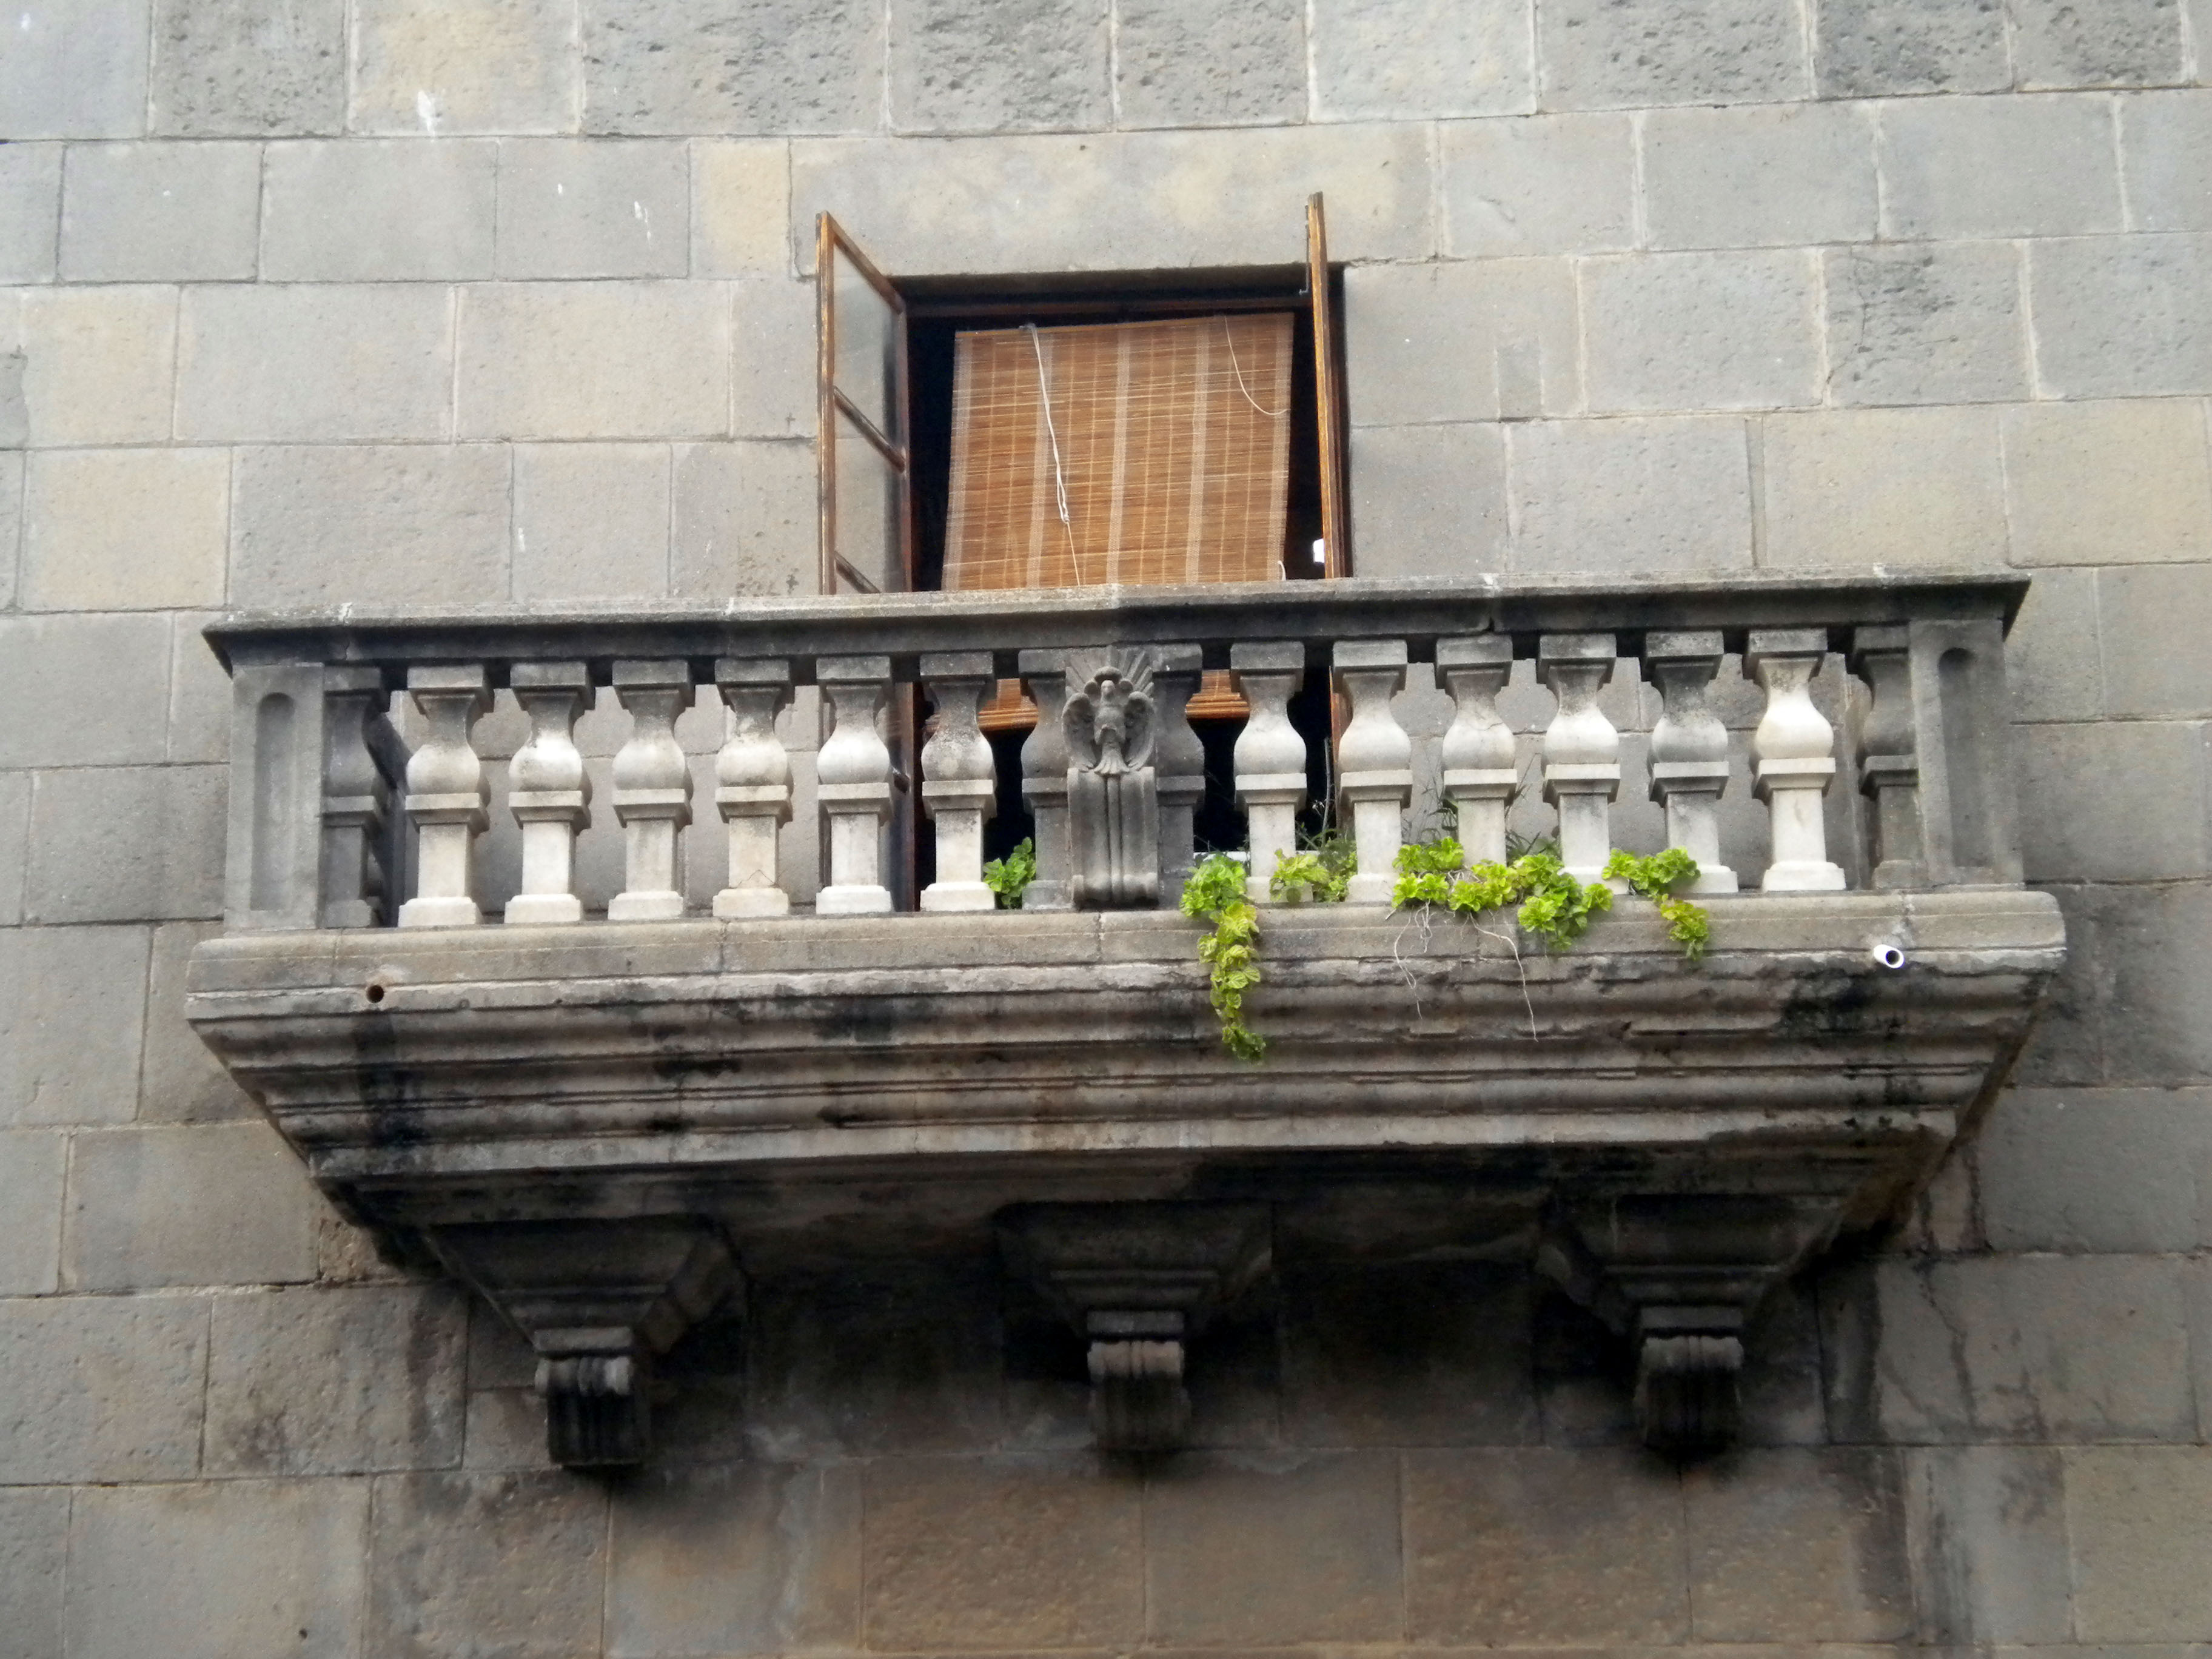 Romeo olvid cu l era el balc n de julieta for What is balcon